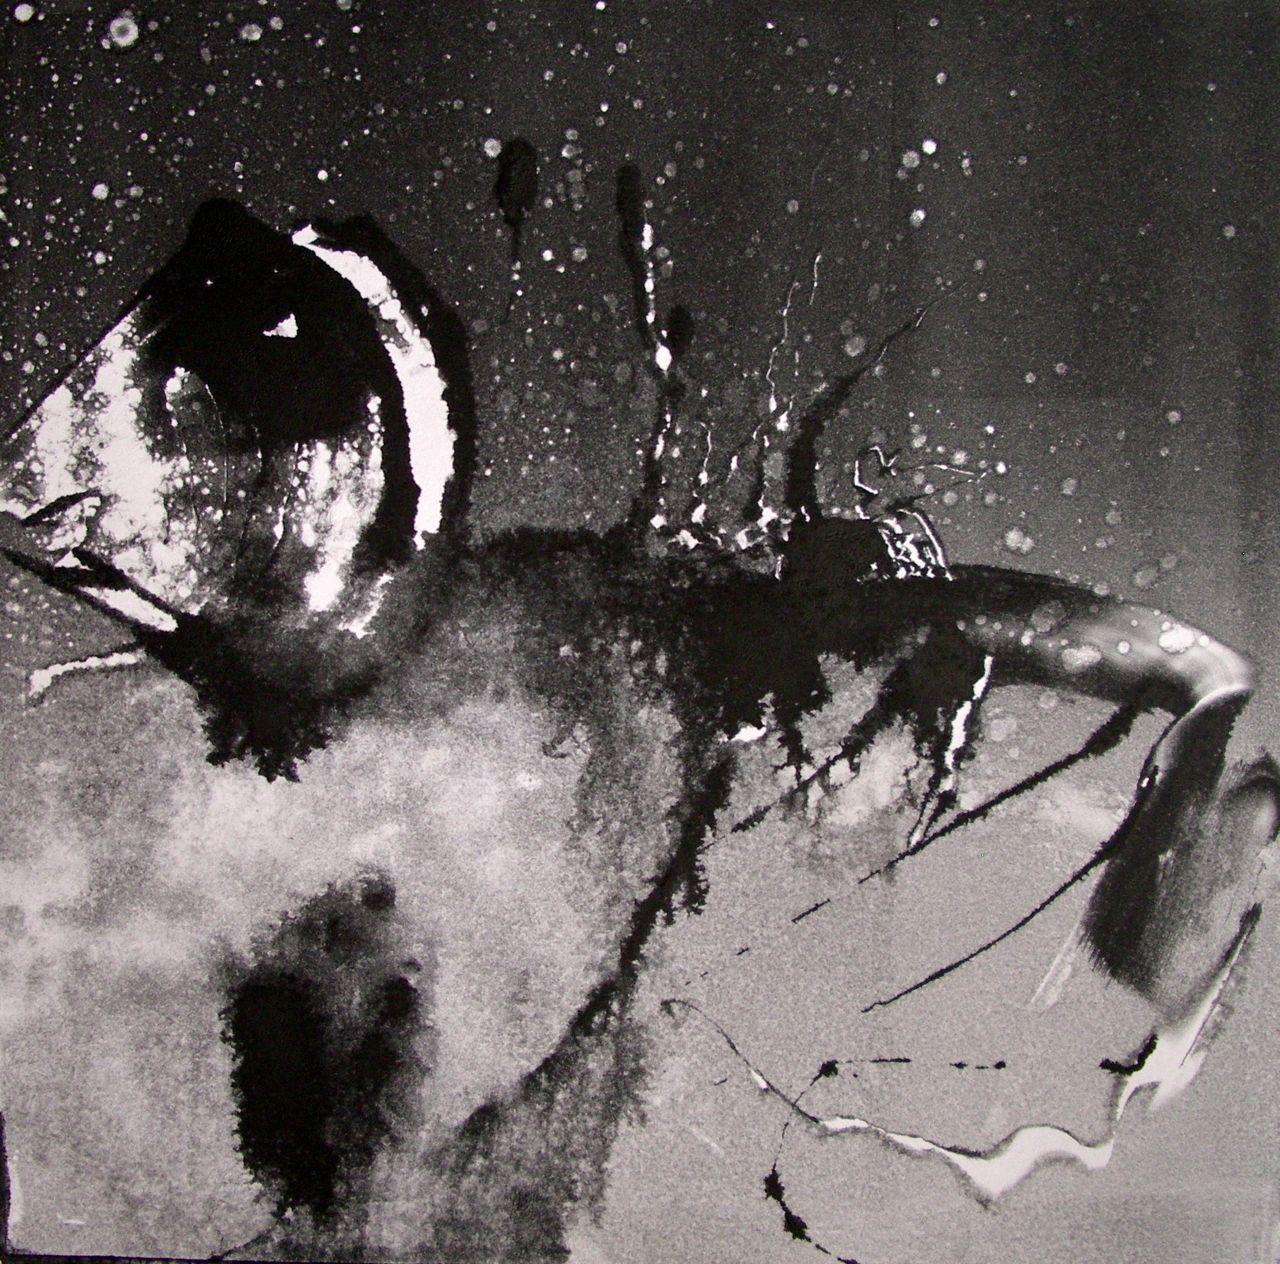 monoprint [205x205mm] Laura Hudson 2014